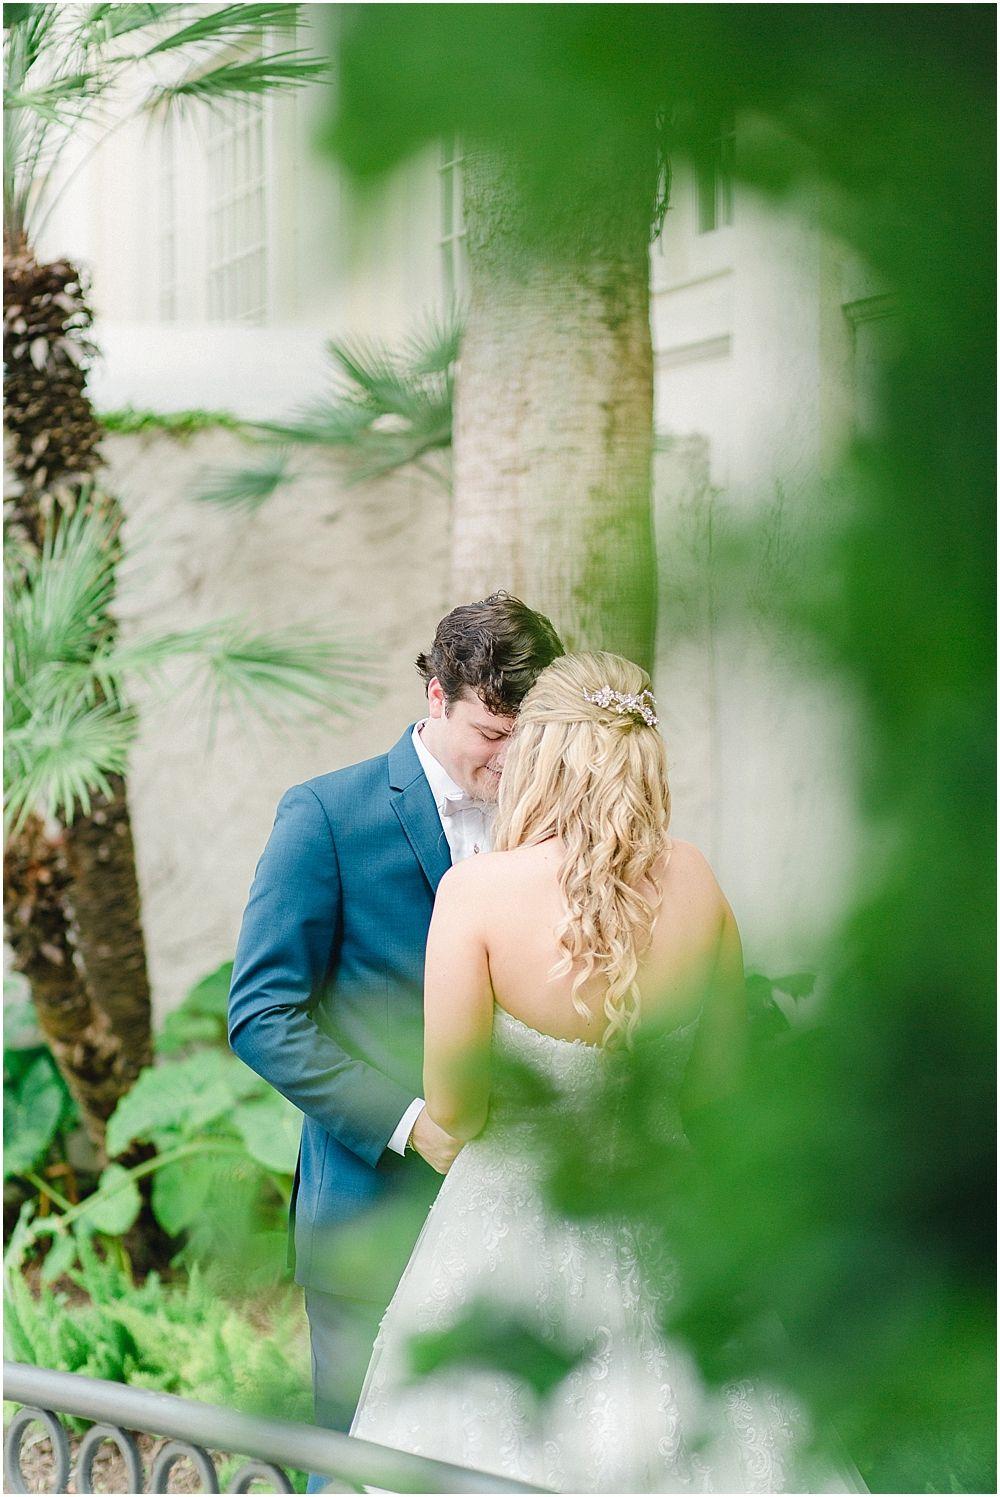 Hotel Galvez Wedding In Galveston, Texas (With Images